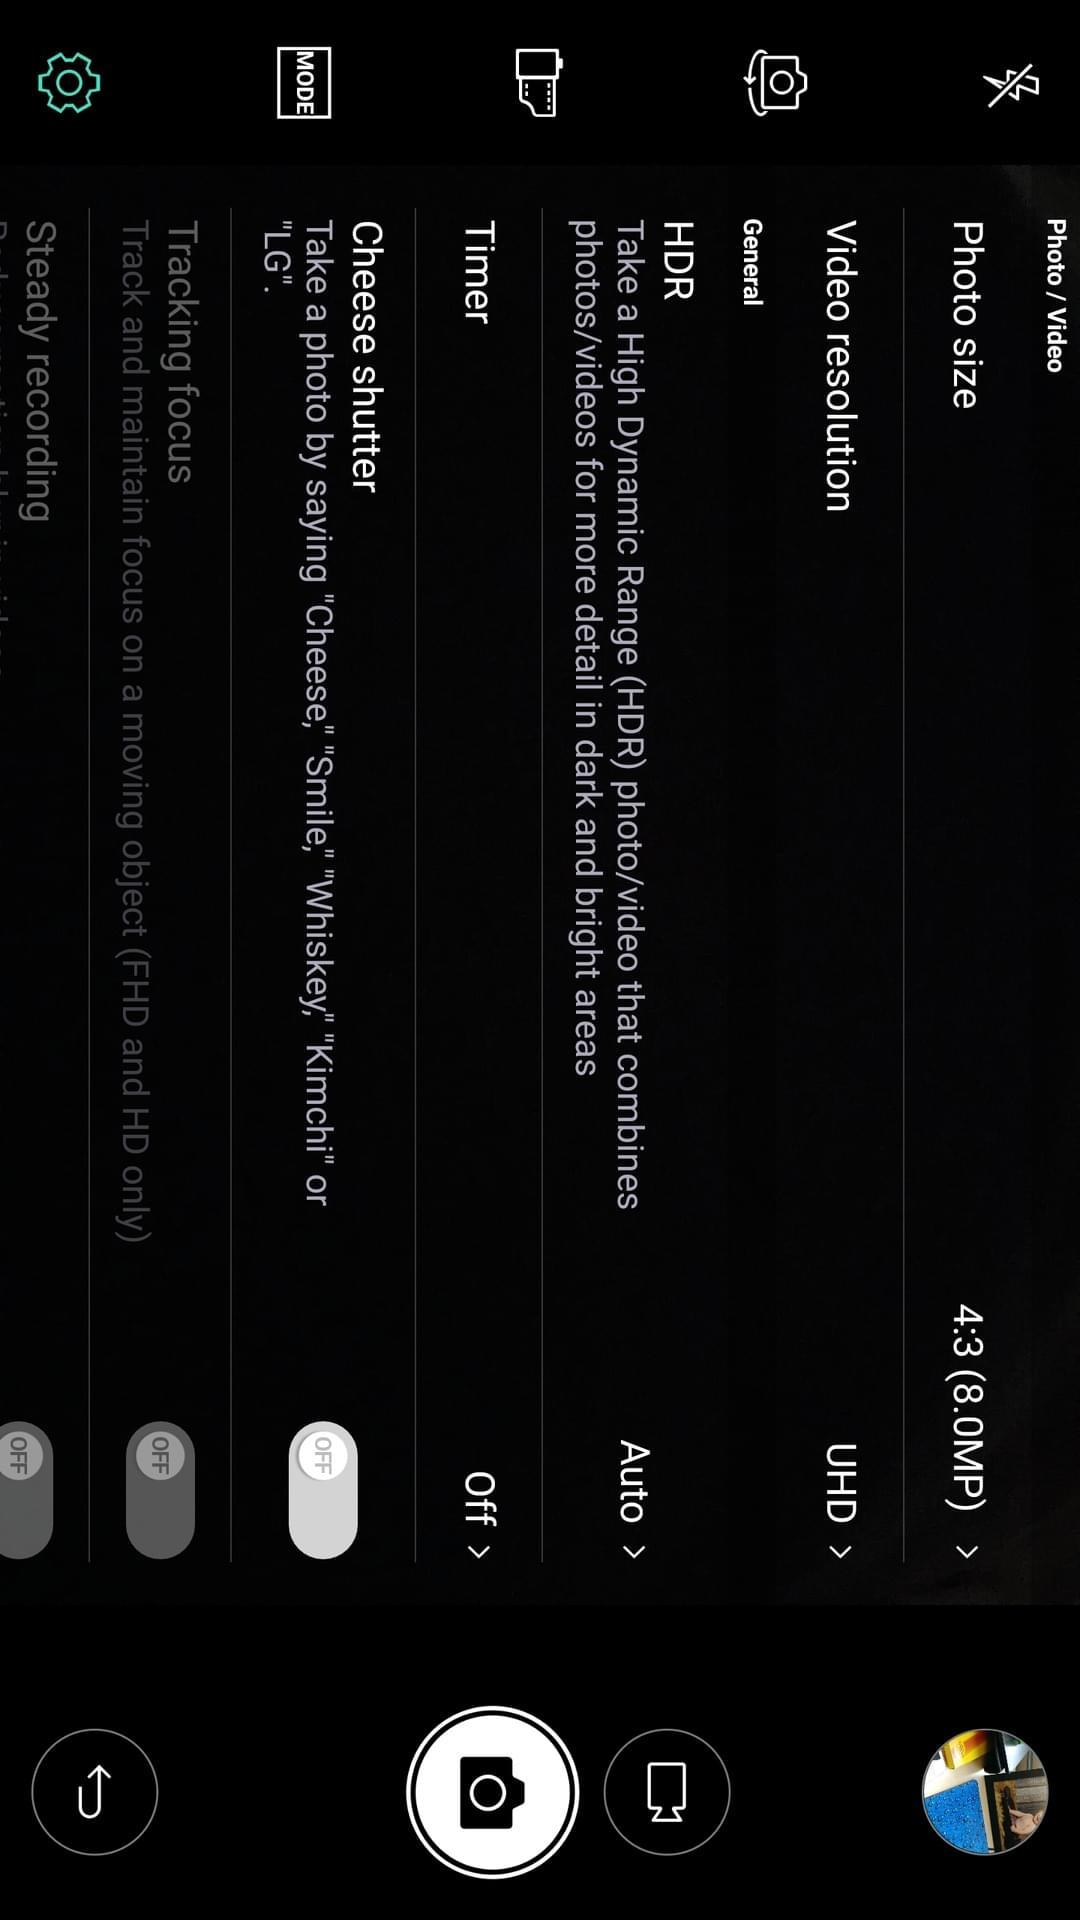 LG V20 AH NS screenshots camera options 1